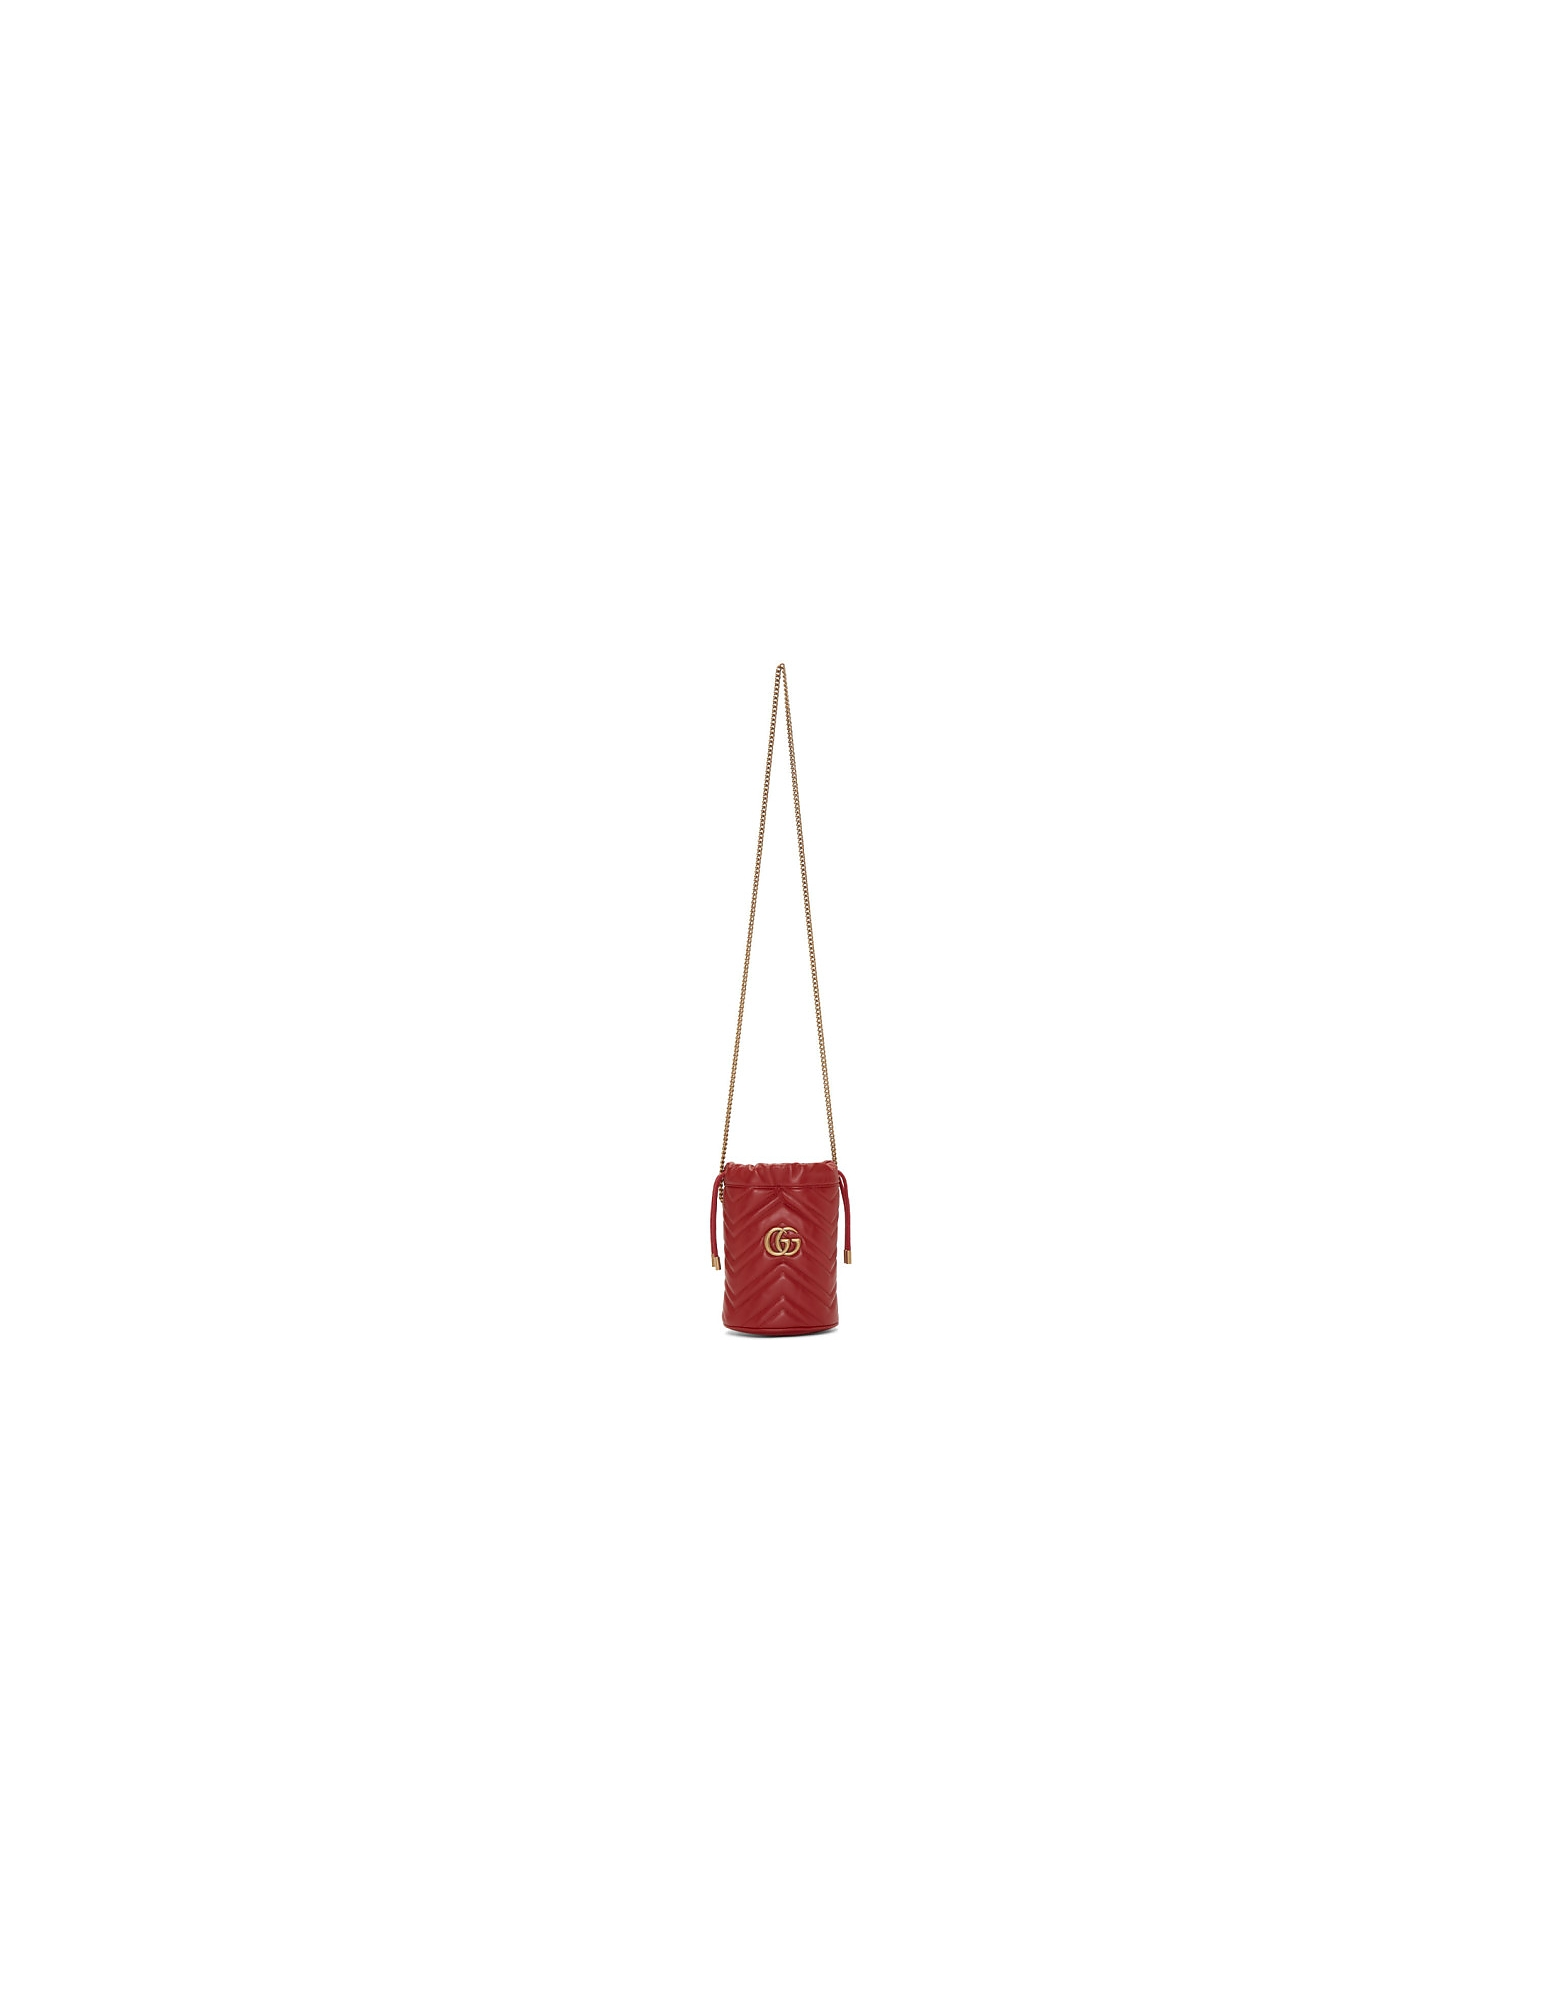 Gucci Designer Handbags, Red Mini GG Marmont Bucket Bag